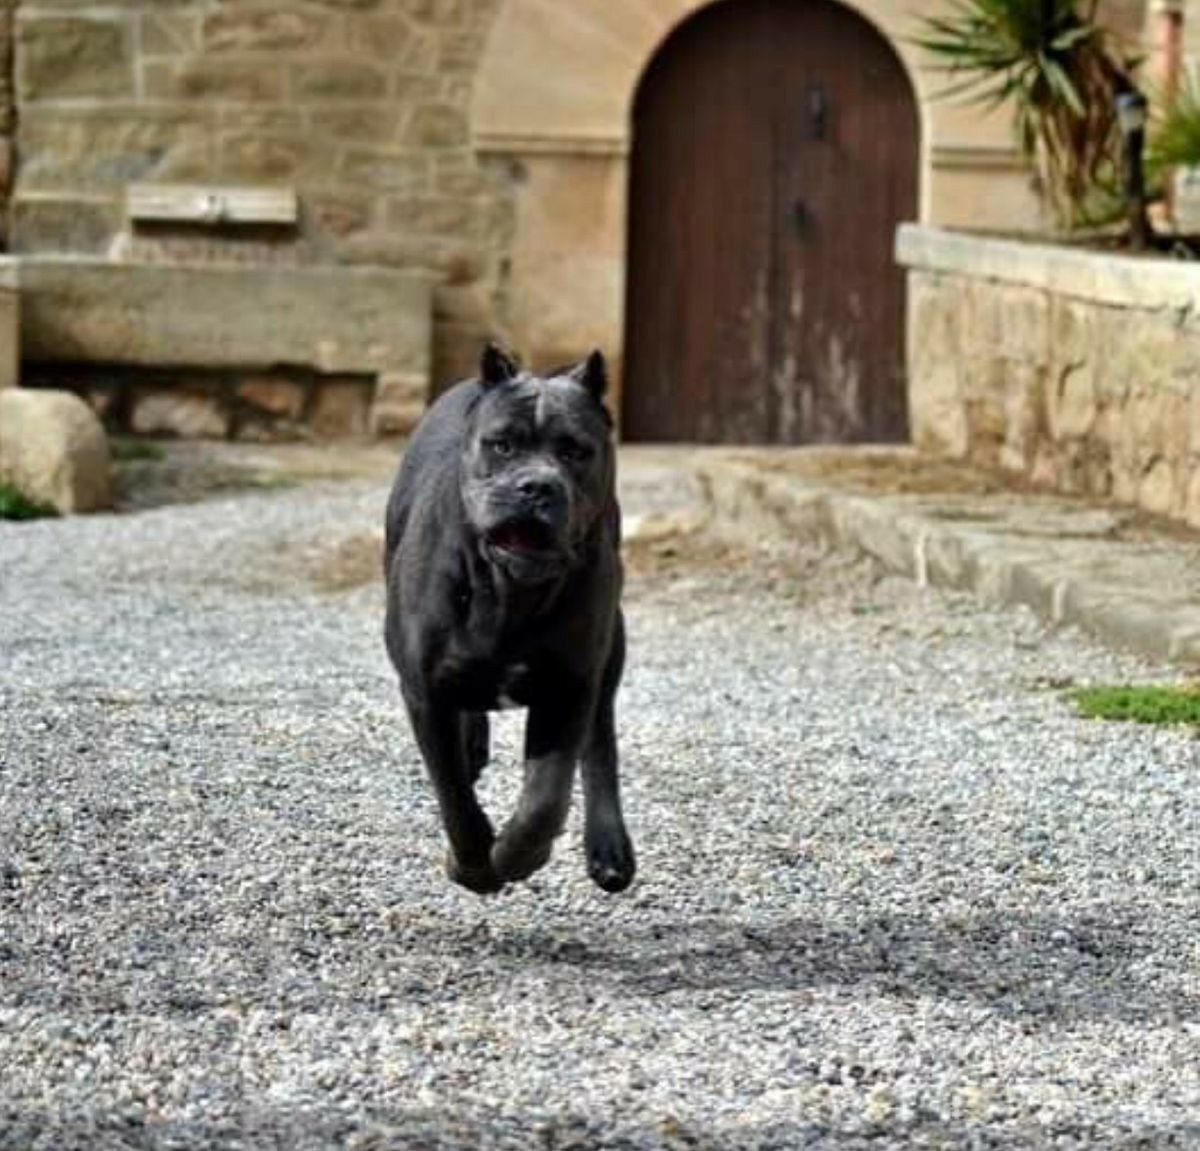 Cane Corso Cane corso, Black pitbull, Dogs